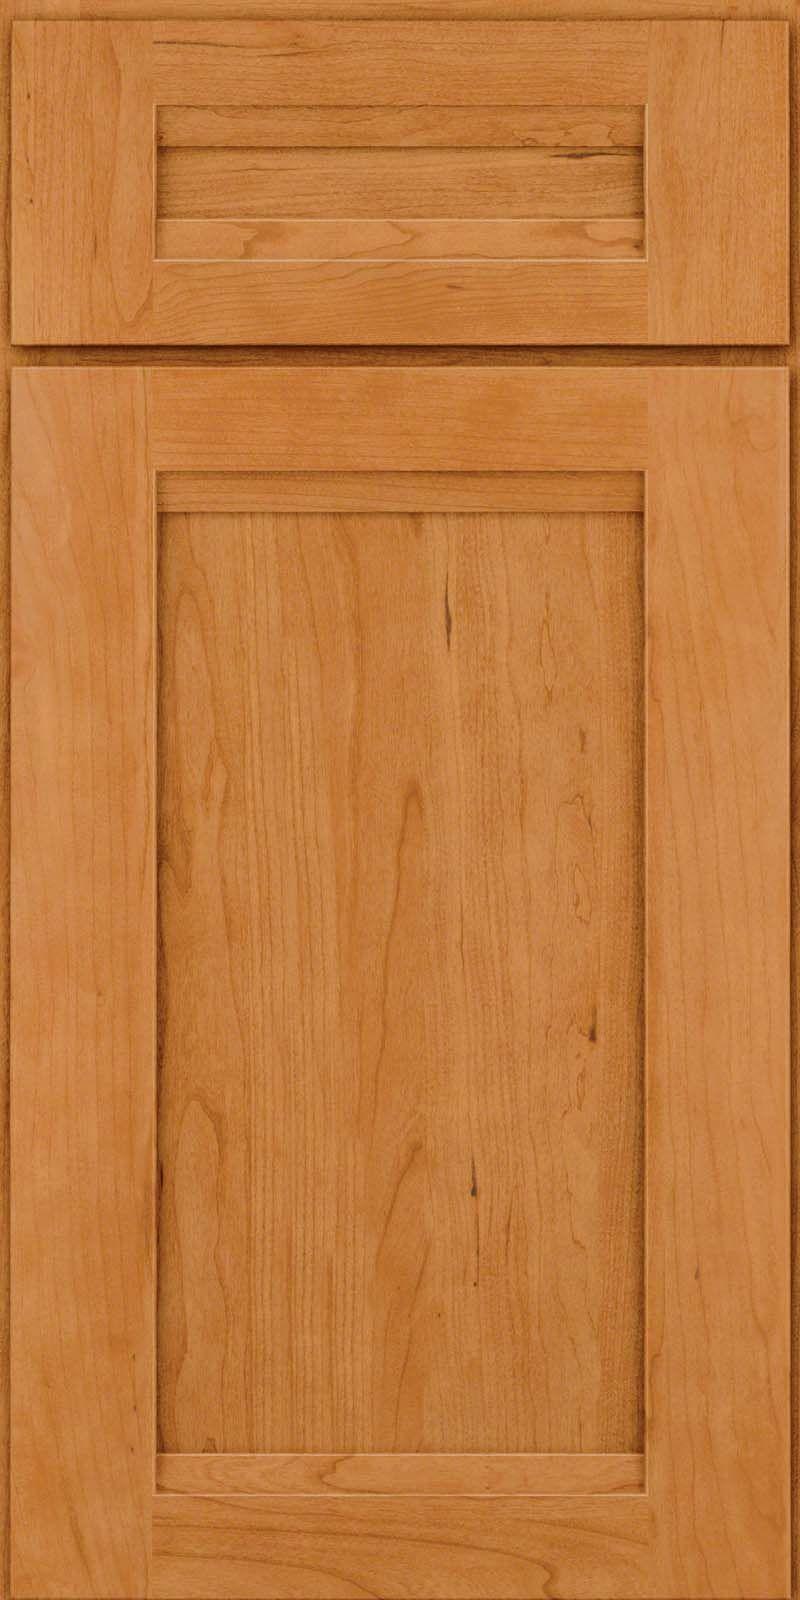 Unique Kraftmaid Cabinet Doors Concept